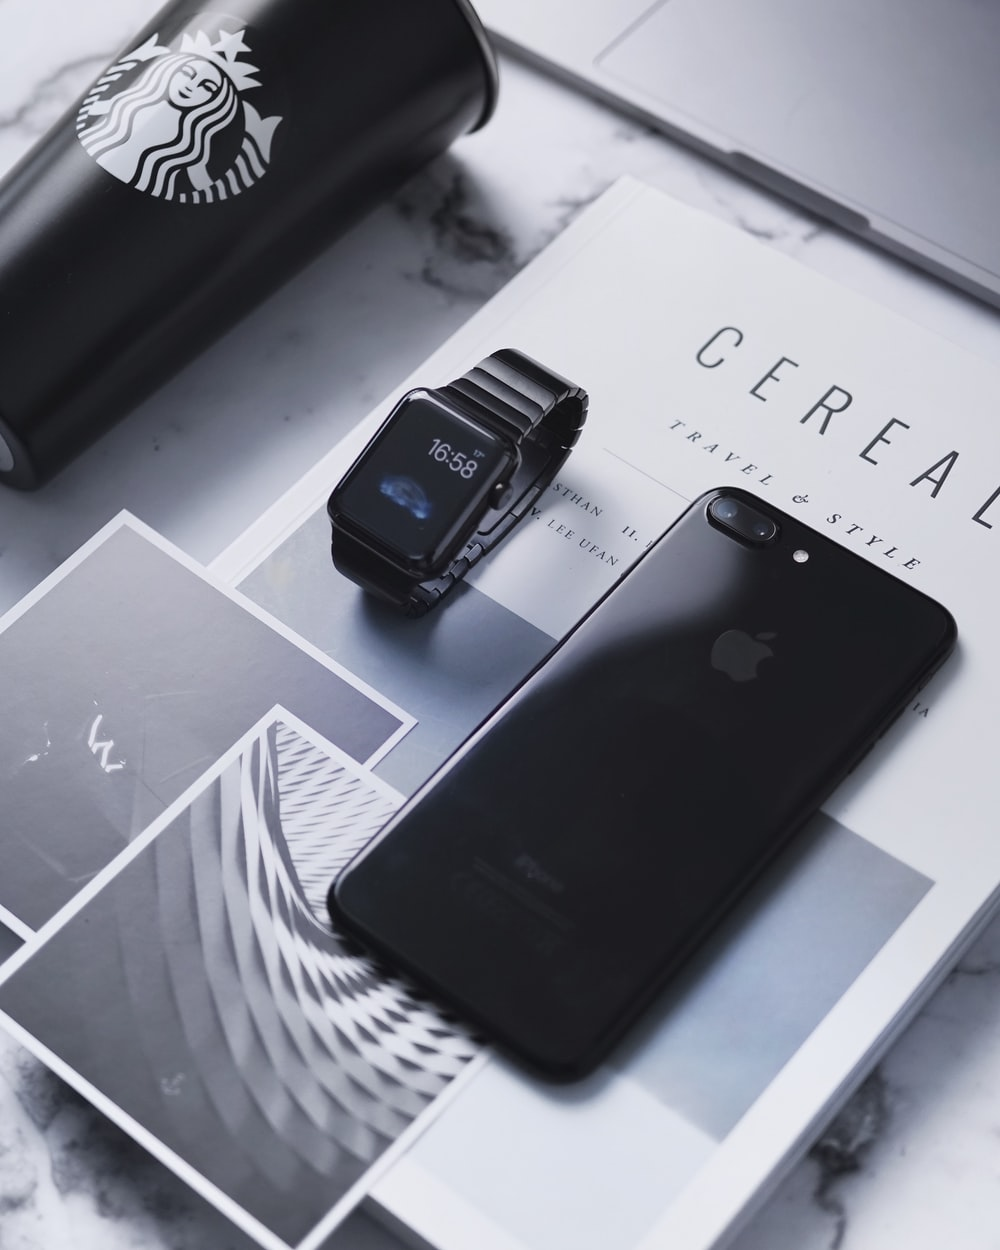 space gray iPhone 8 Plus beside space black aluminum case Apple Watch